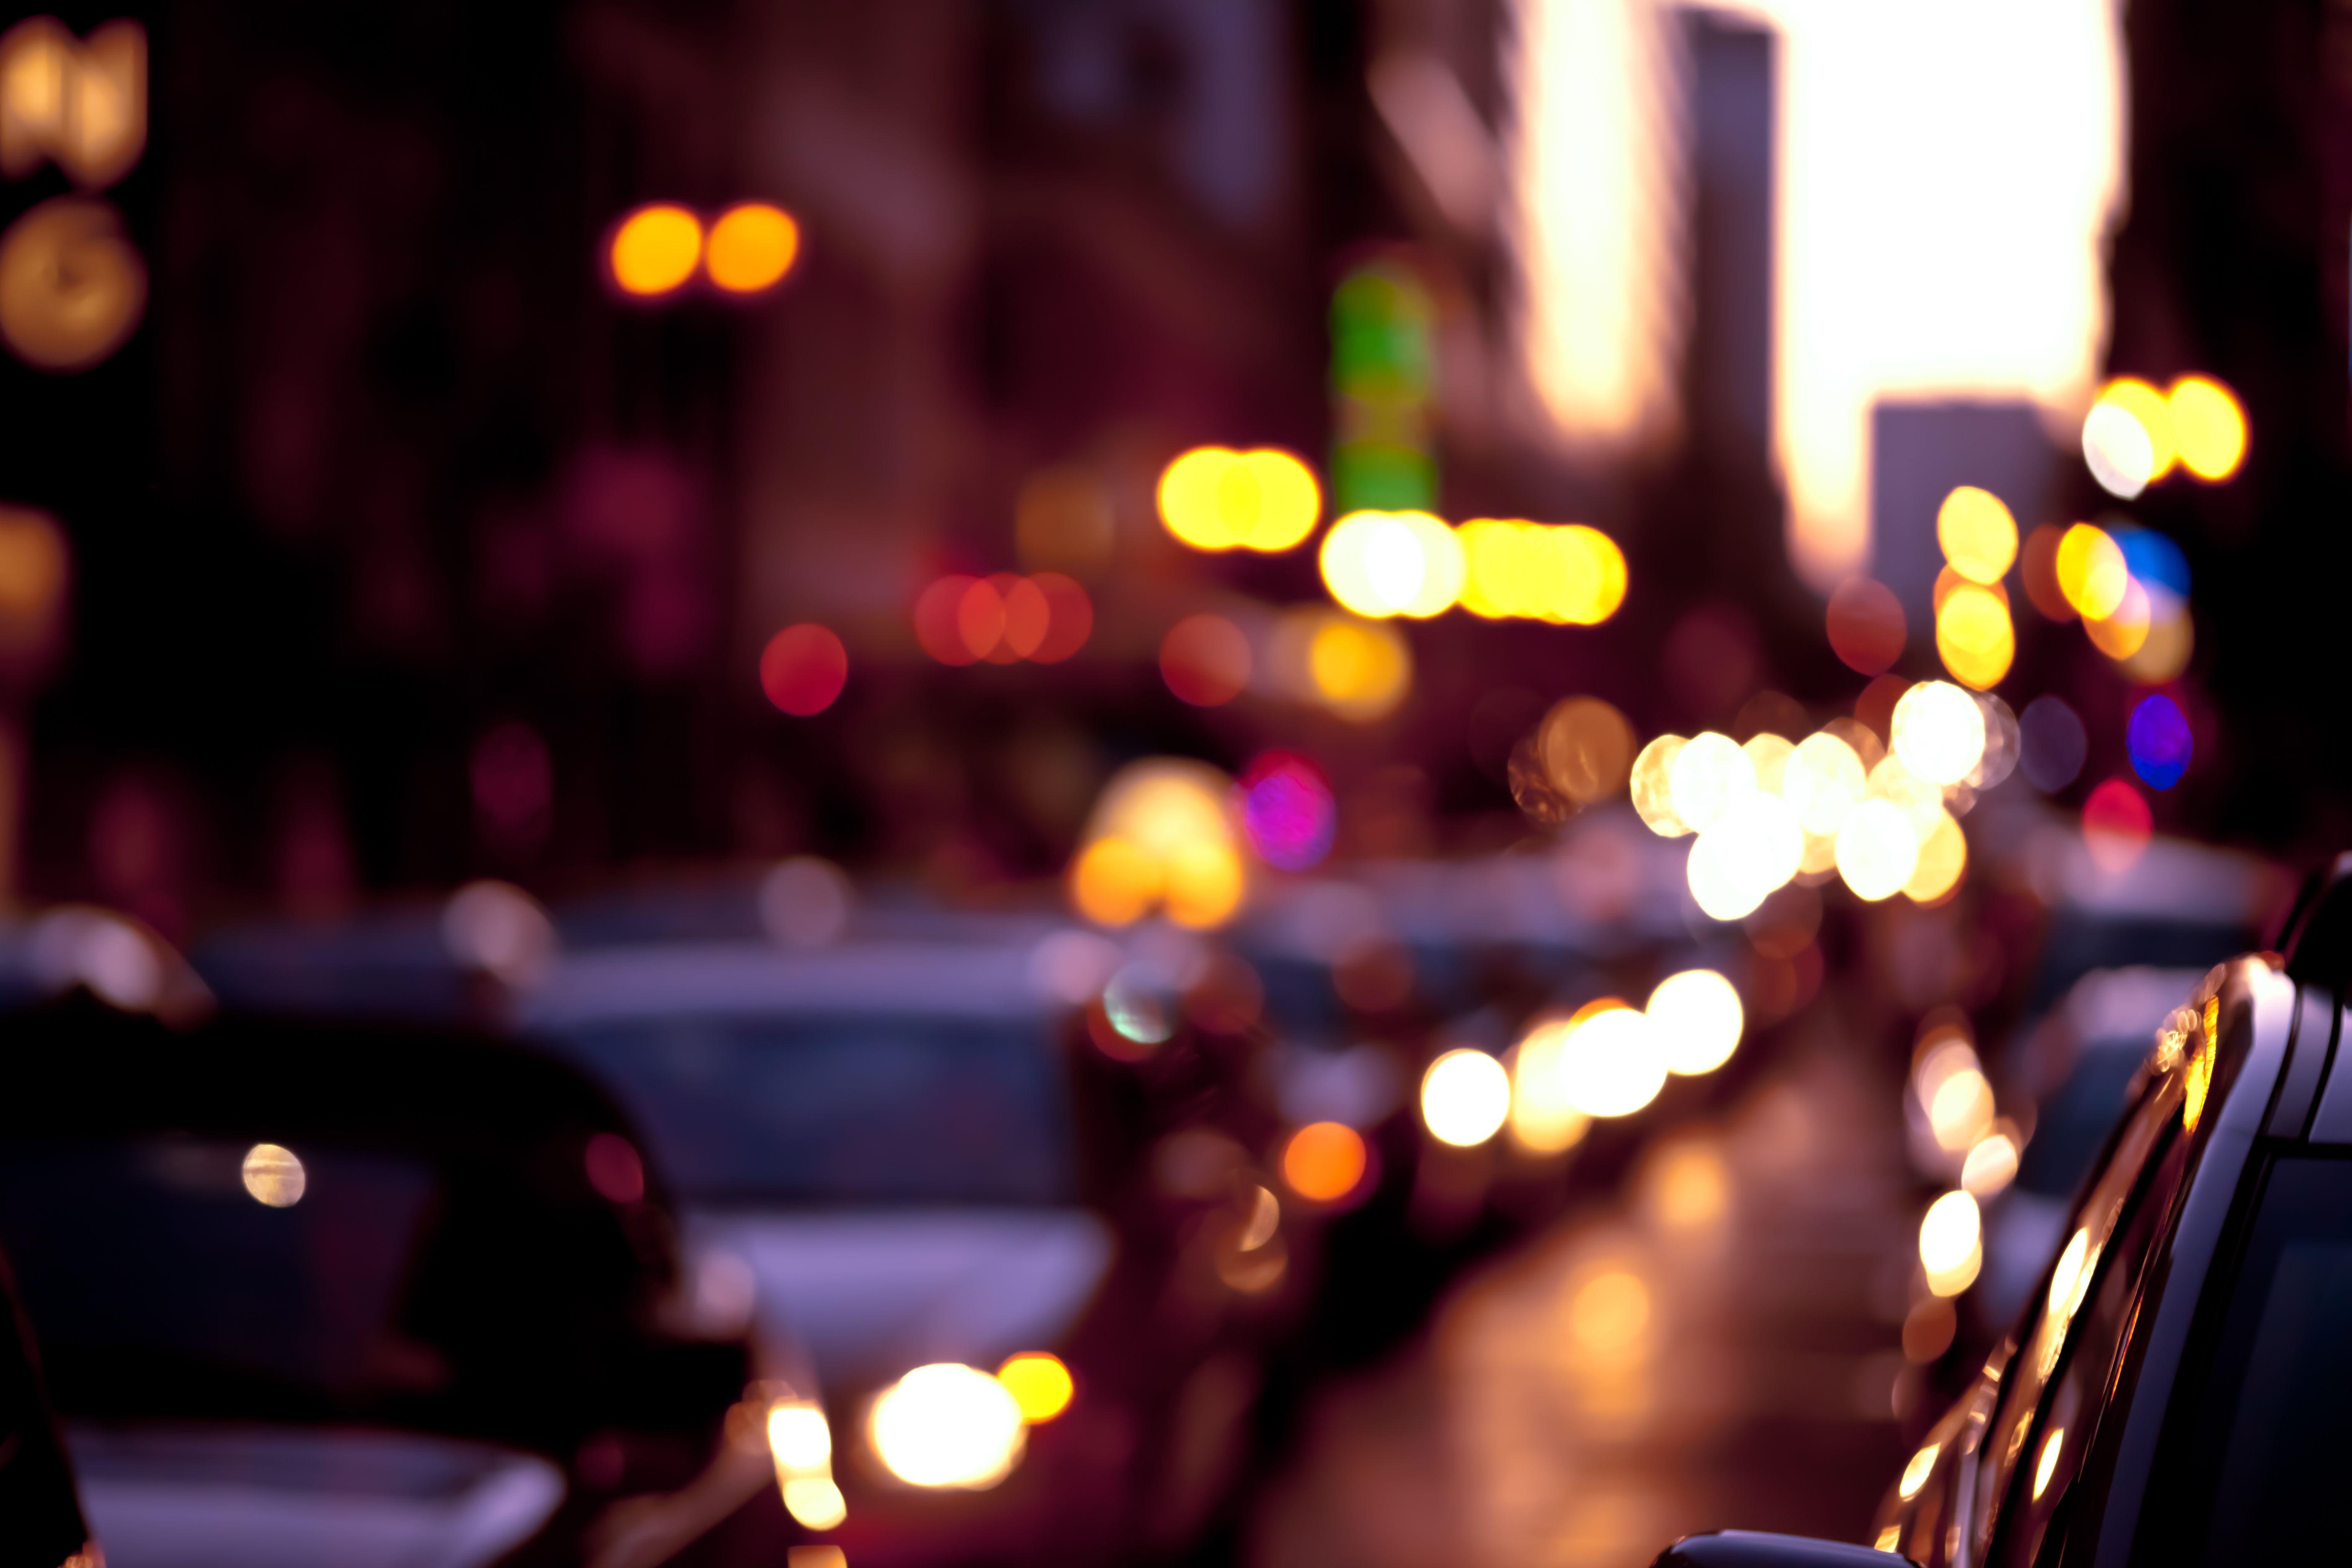 Bokeh Traffic in The City Full HD Wallpaper